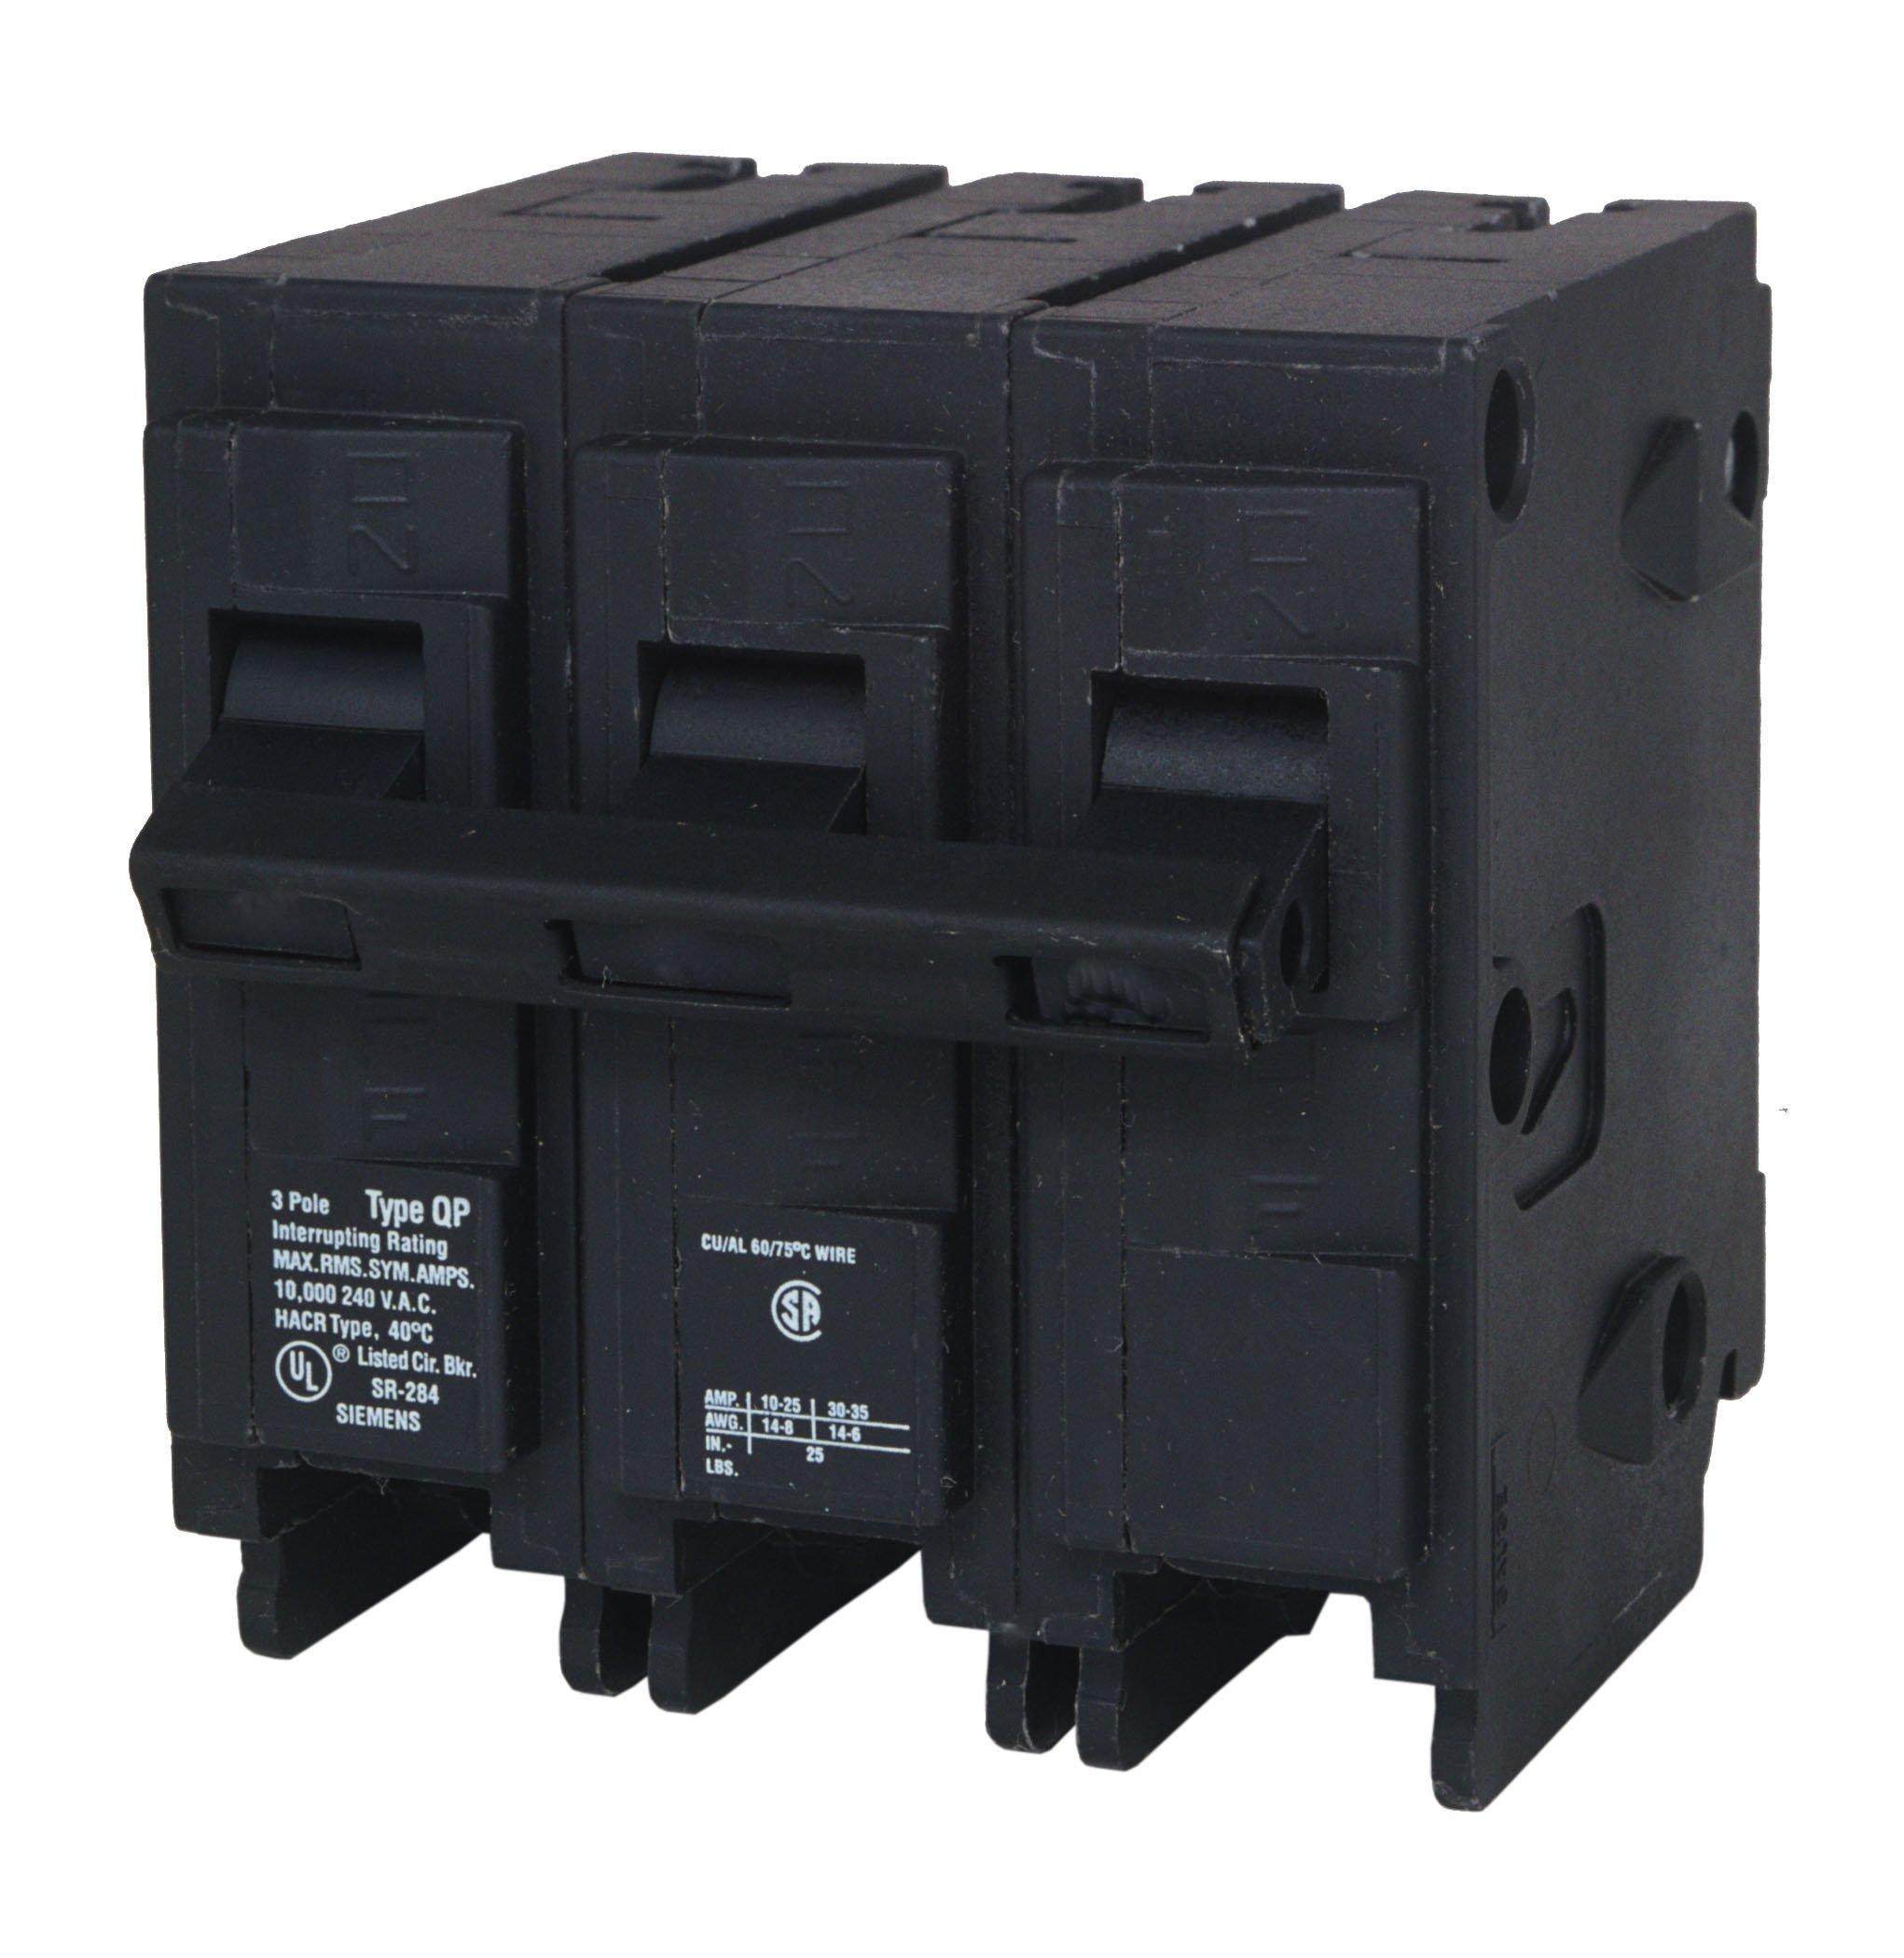 Q390 90-Amp Three Pole Type QP Circuit Breaker